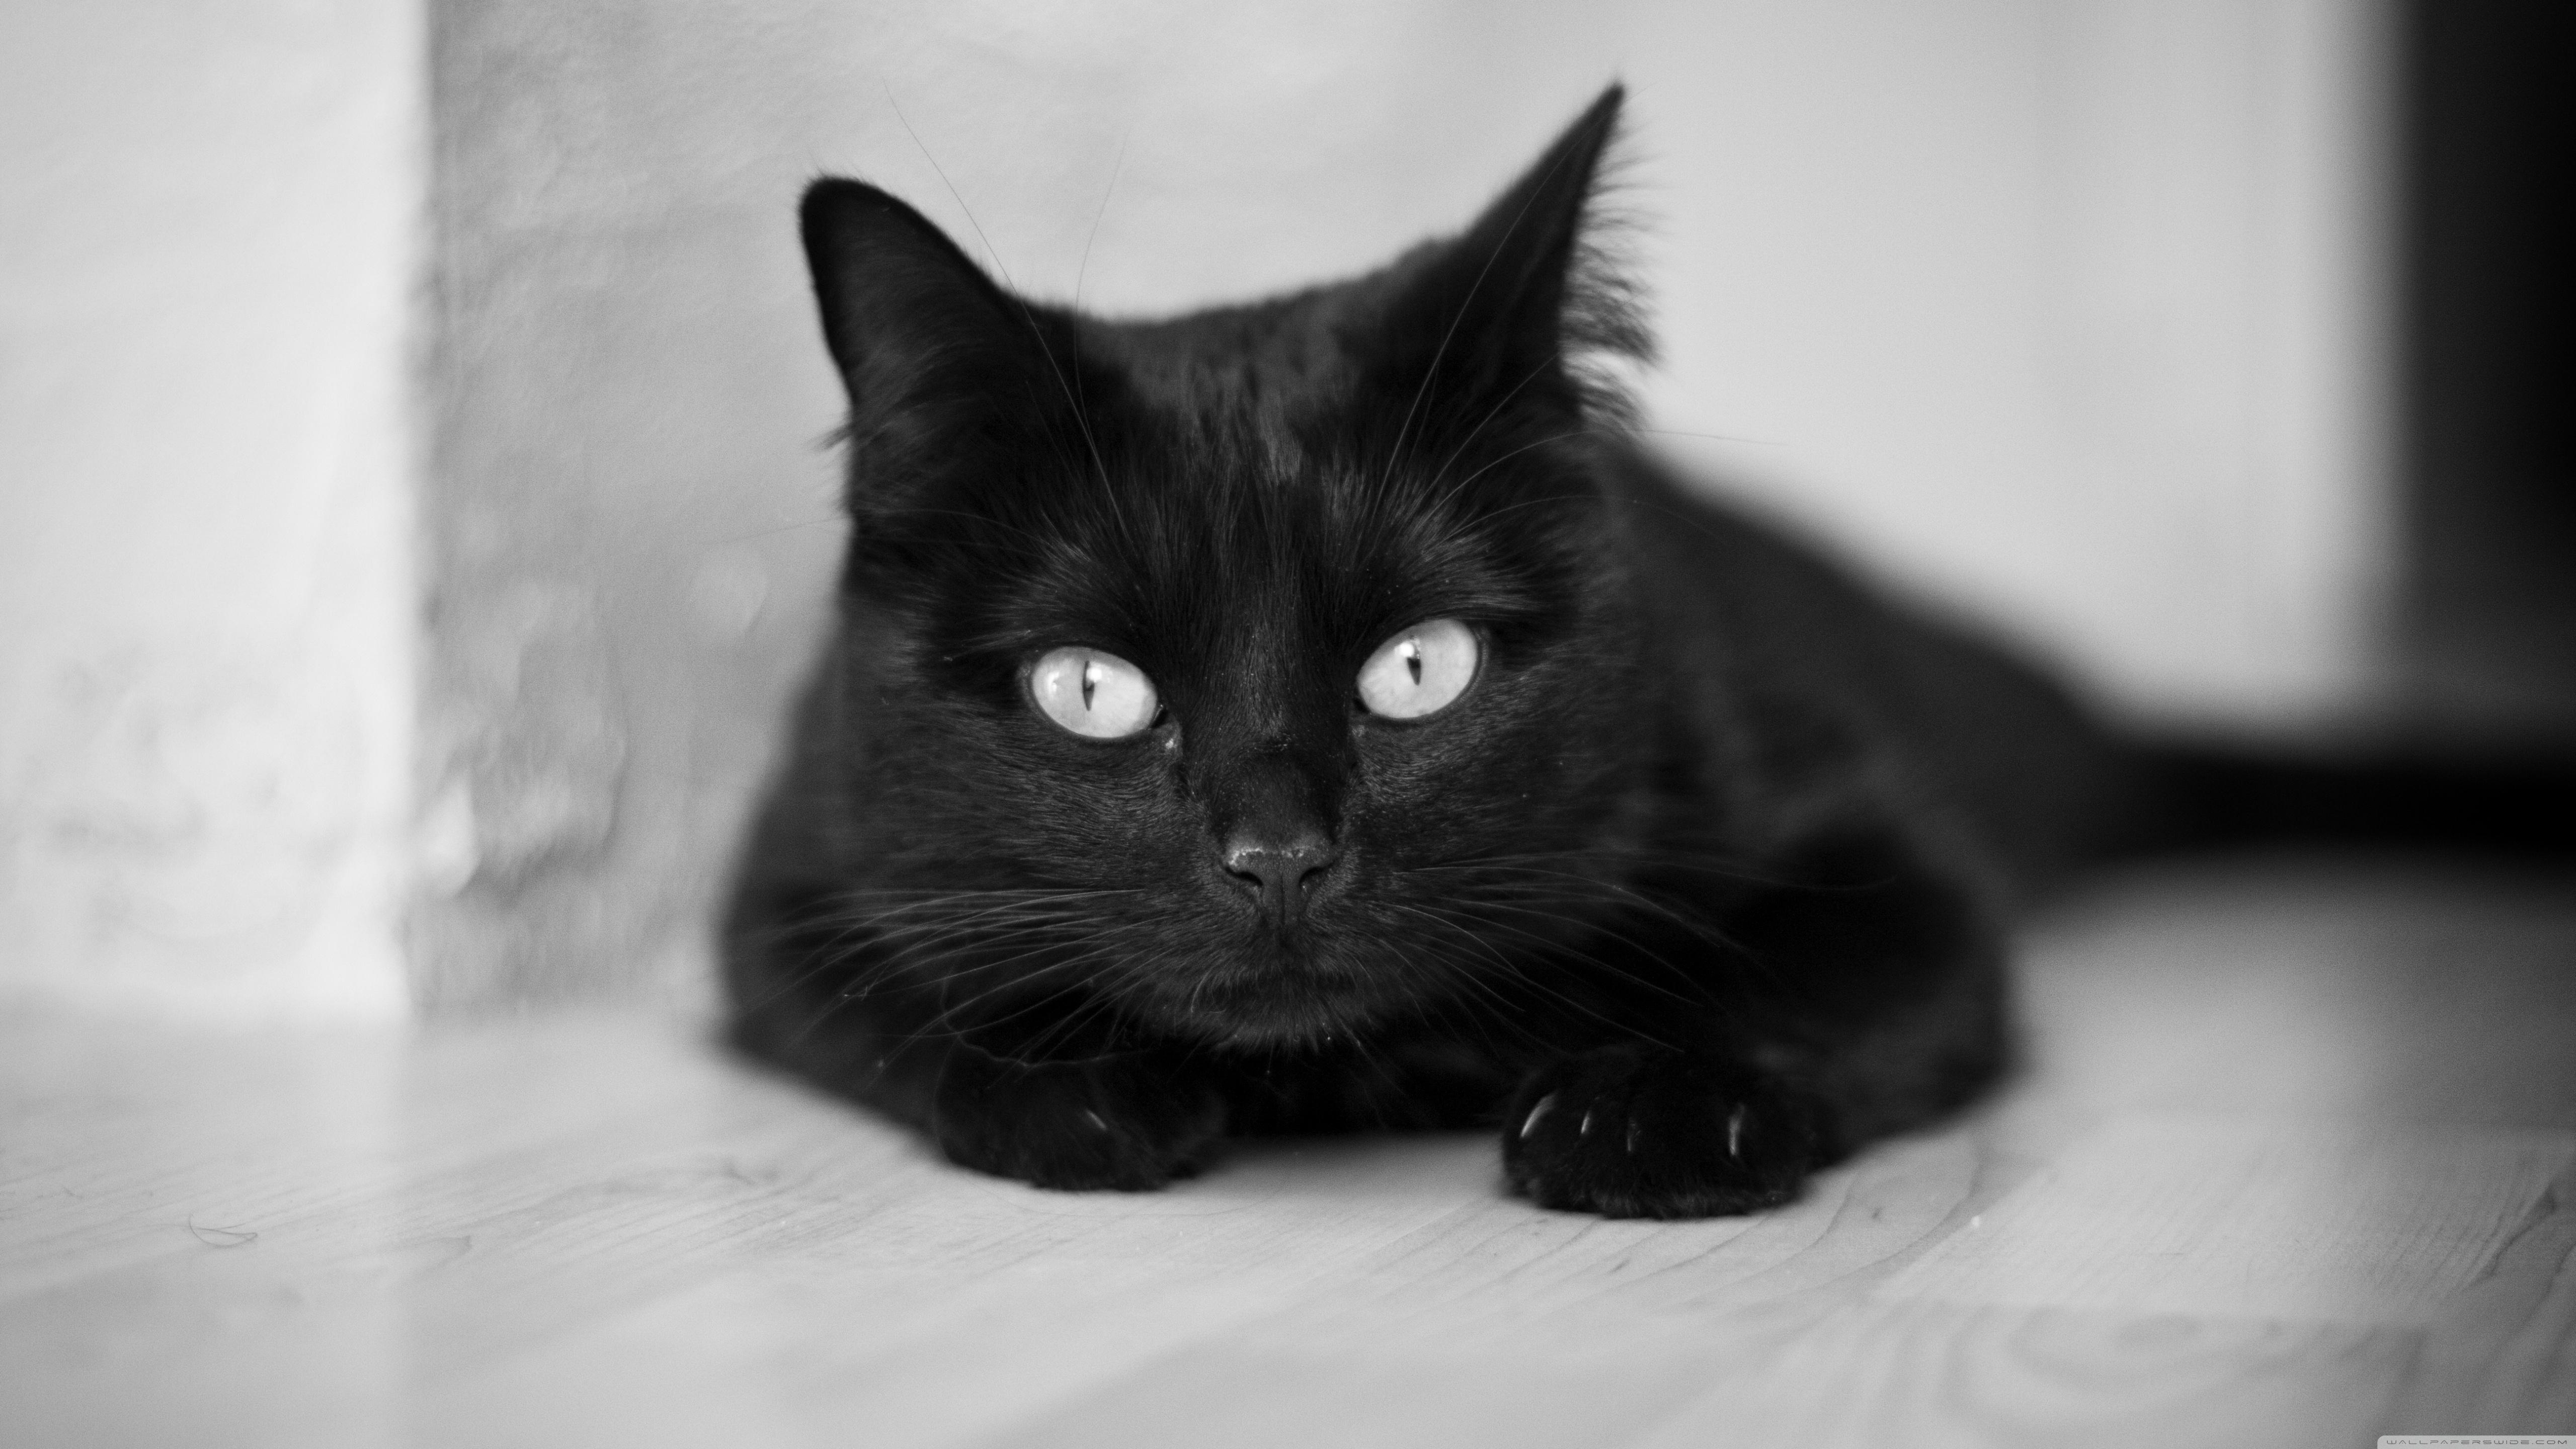 Hdwallpapers87.com Download Black Cat Desktop Wallpaper